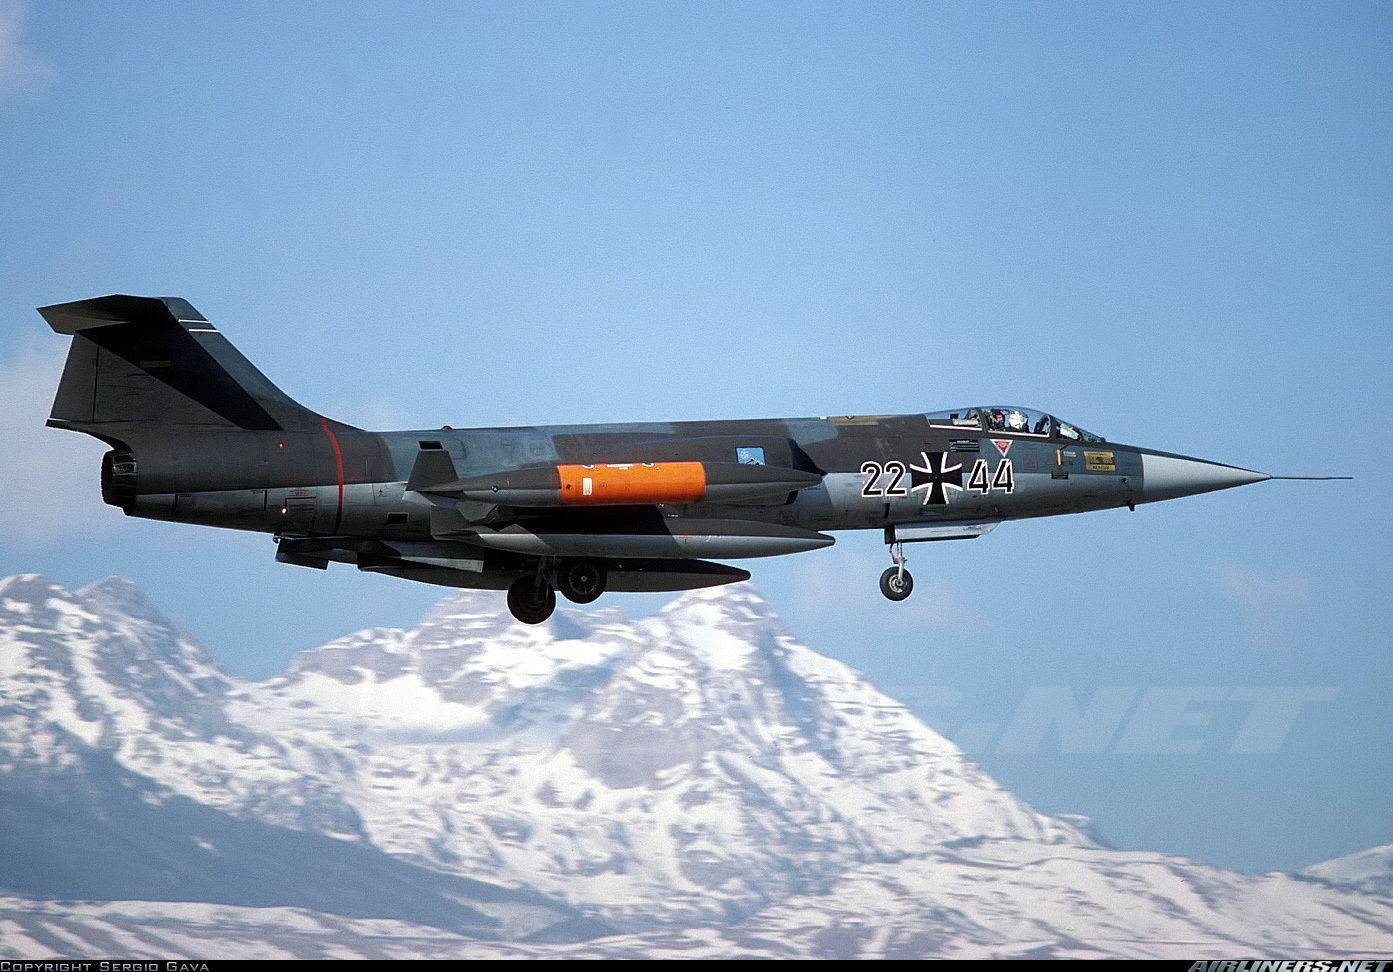 Lockheed (Messerschmitt) F-104G Starfighter